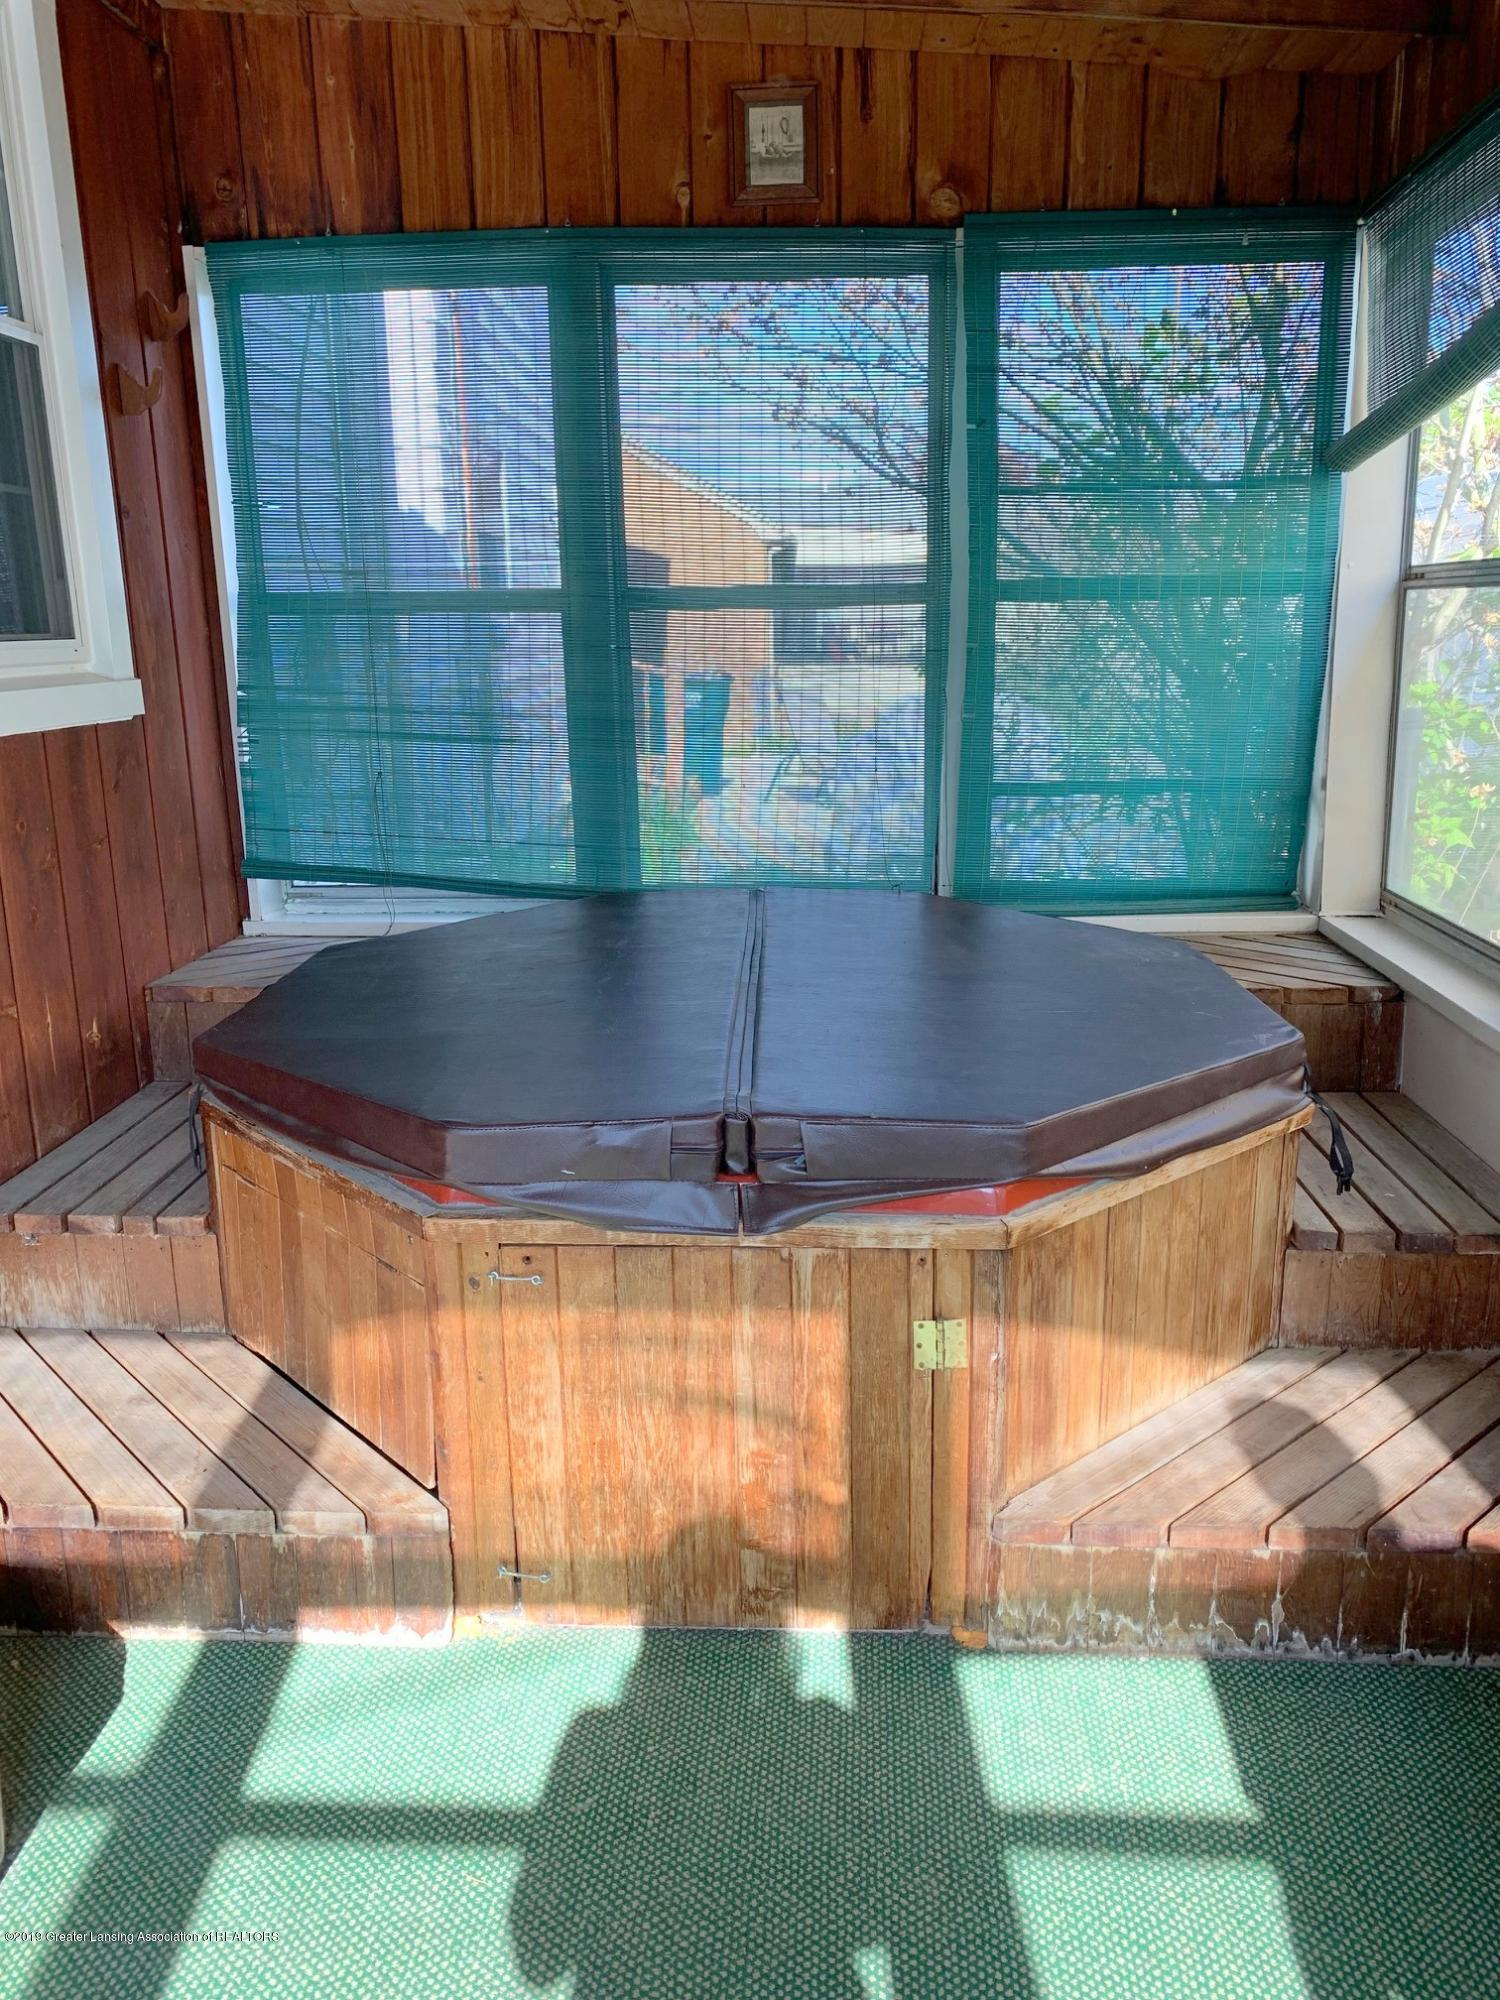 1116 Pershing Dr - Sun Porch Hot Tub - 33